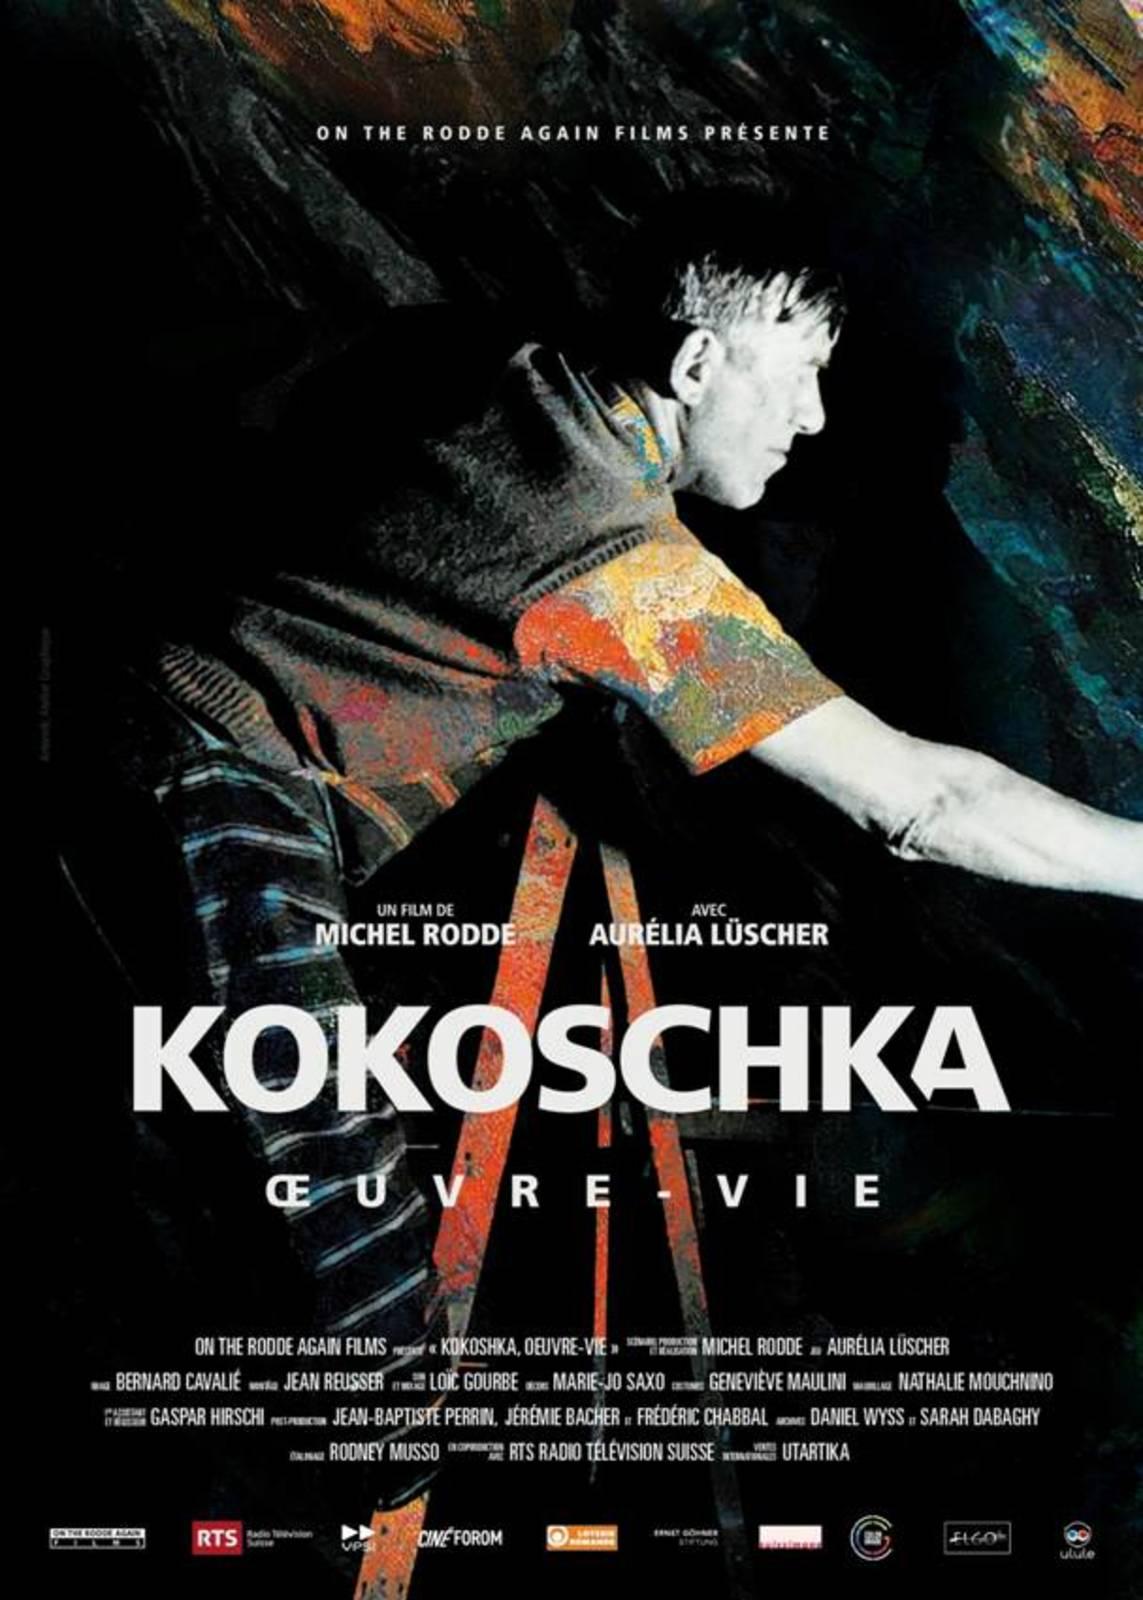 «Kokoschka, Oeuvre - Vie» un film de «Michel Rodd» (2017) Production : On the Rodde Again Format : 16 : 9  BANDE ANNONCE